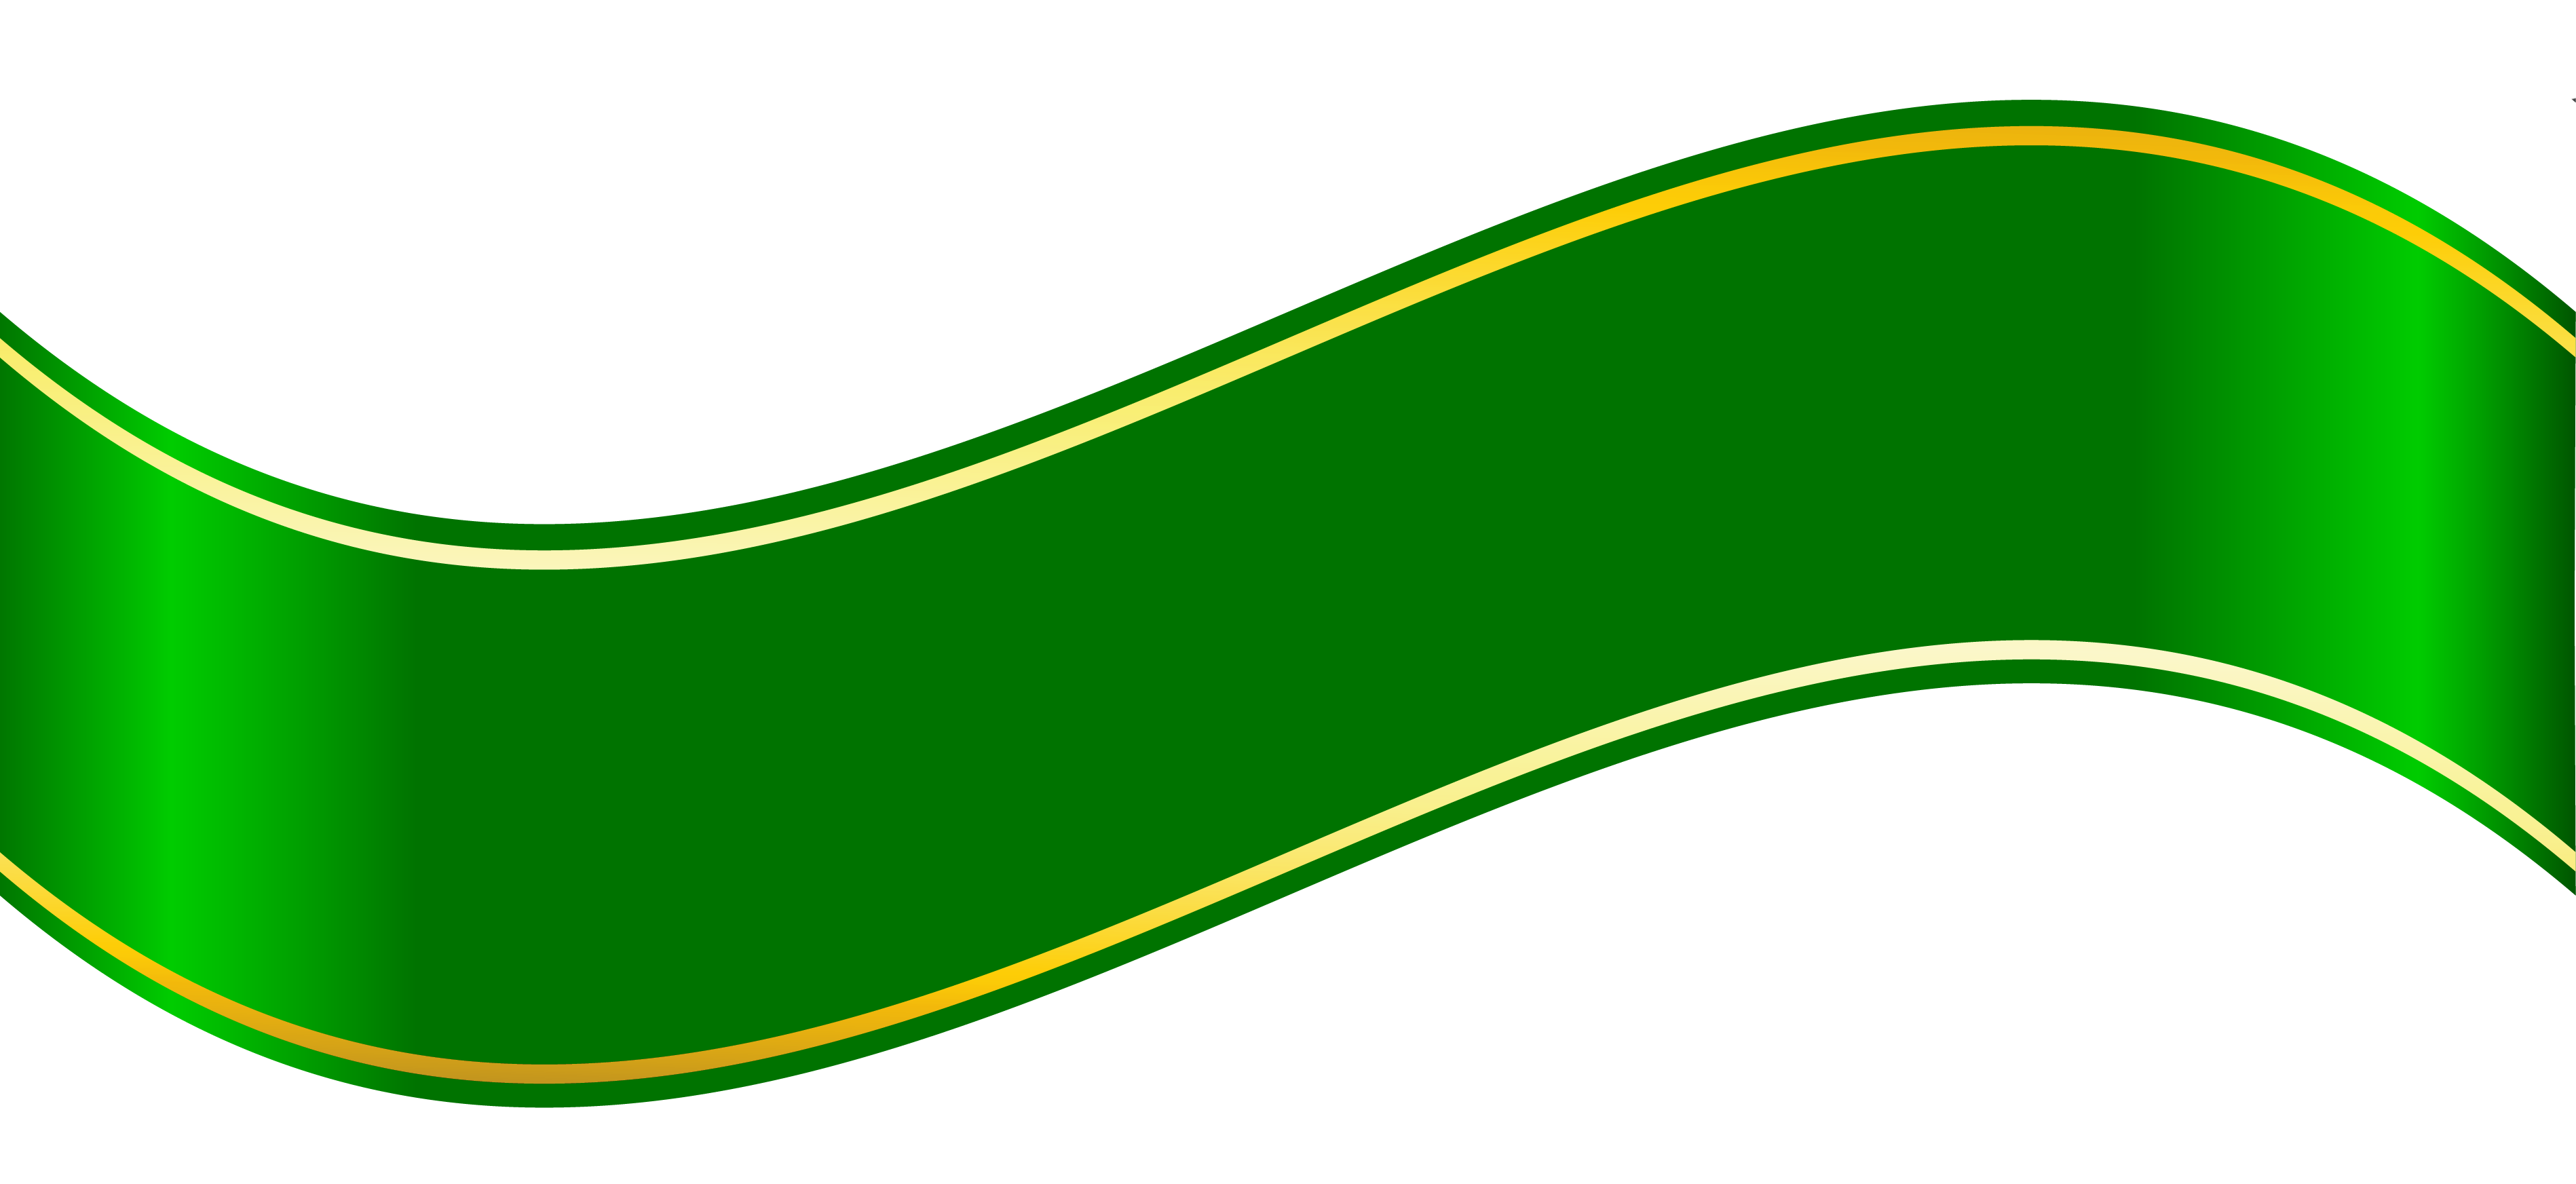 Green Ribbon Download Transparent PNG Image | PNG Arts